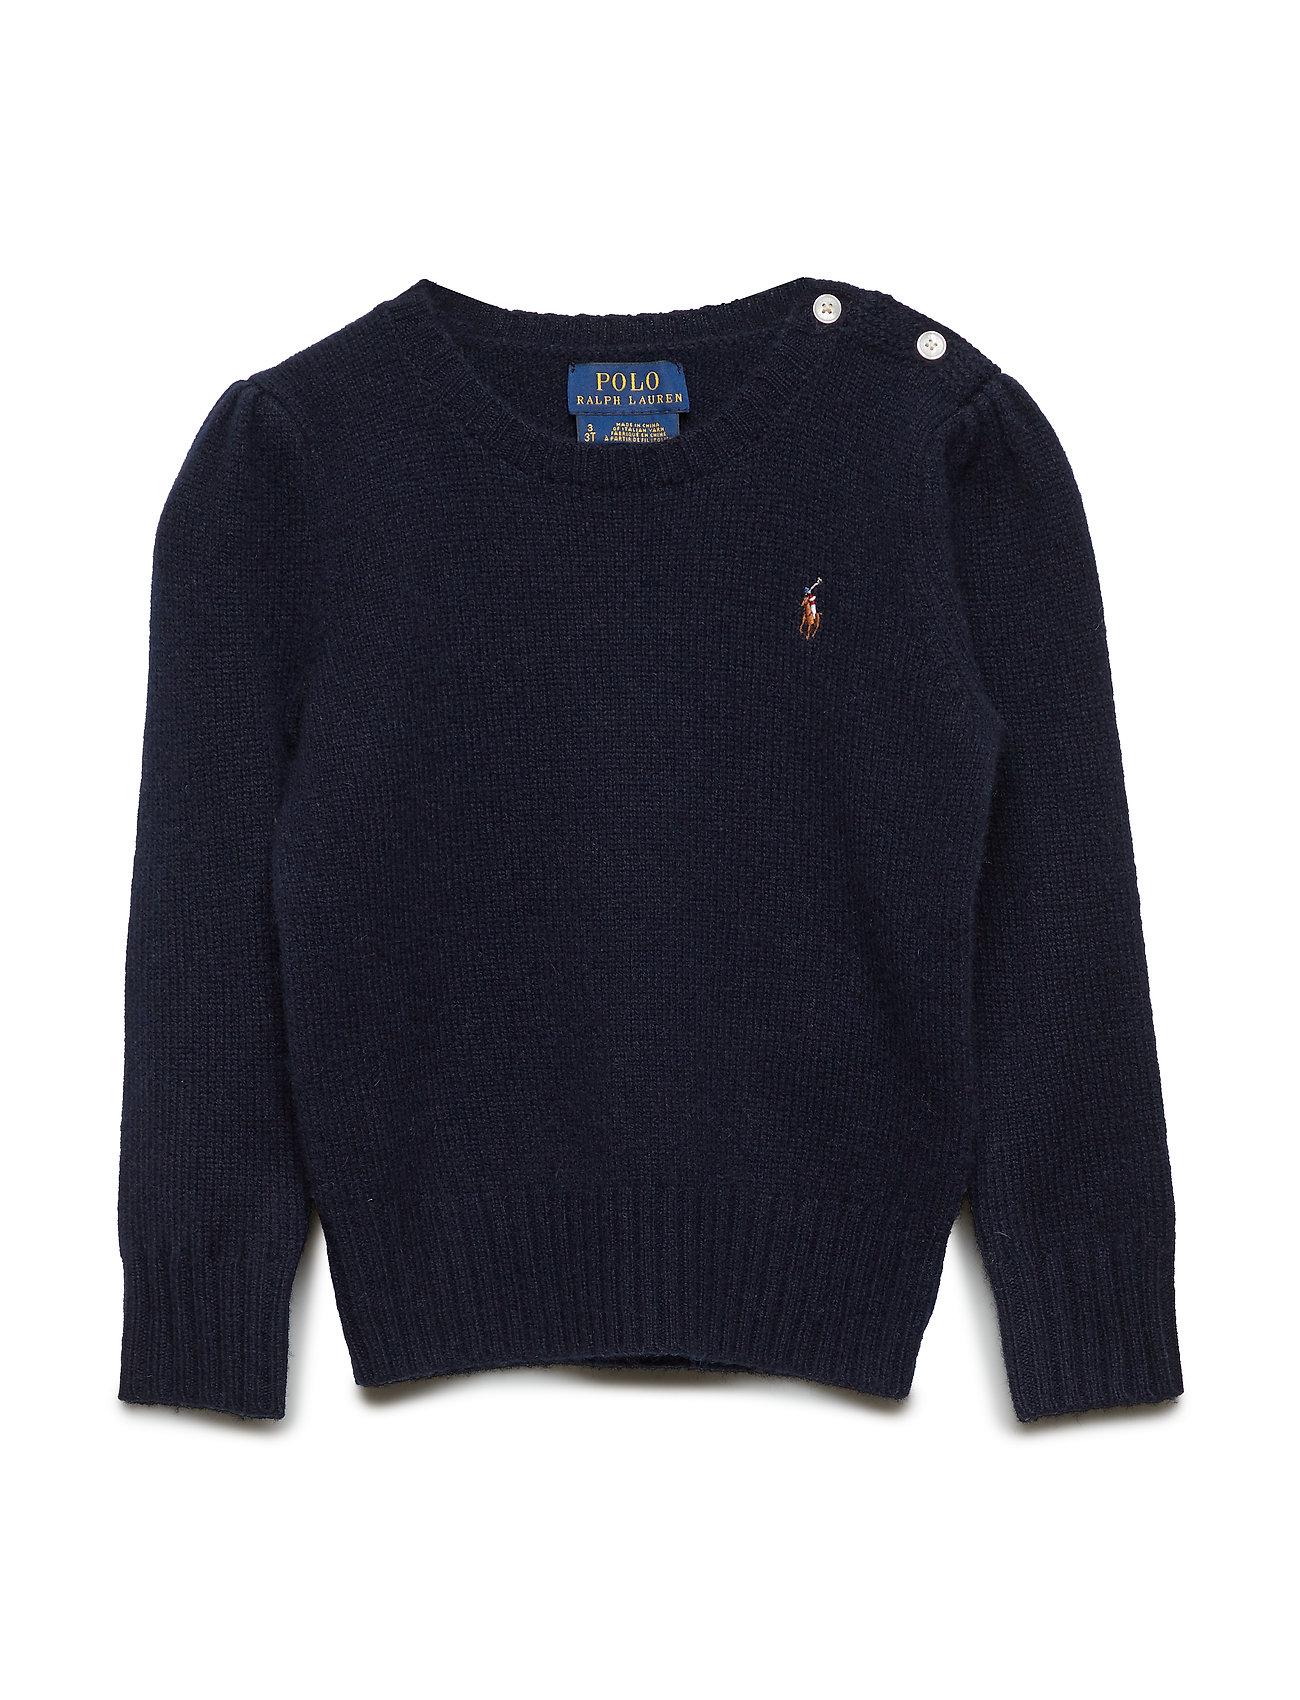 Ralph Lauren Kids Wool-Cashmere Crewneck Sweater - RL NAVY